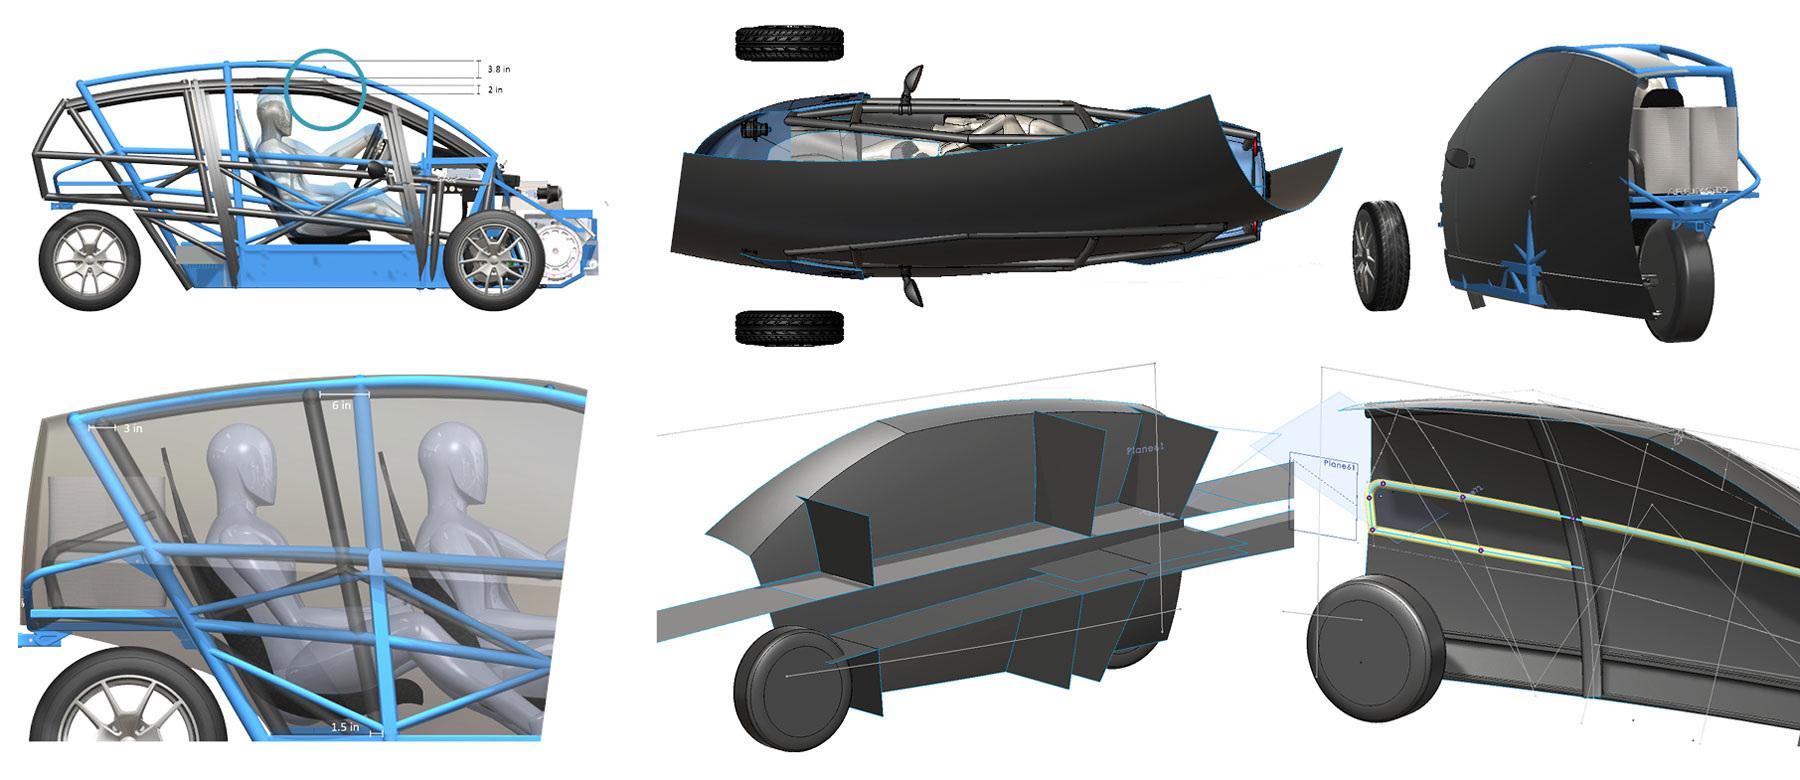 ARCIMOTO EVs Gen7 - COURANA | Multidisciplinary design by Marcos Nolan